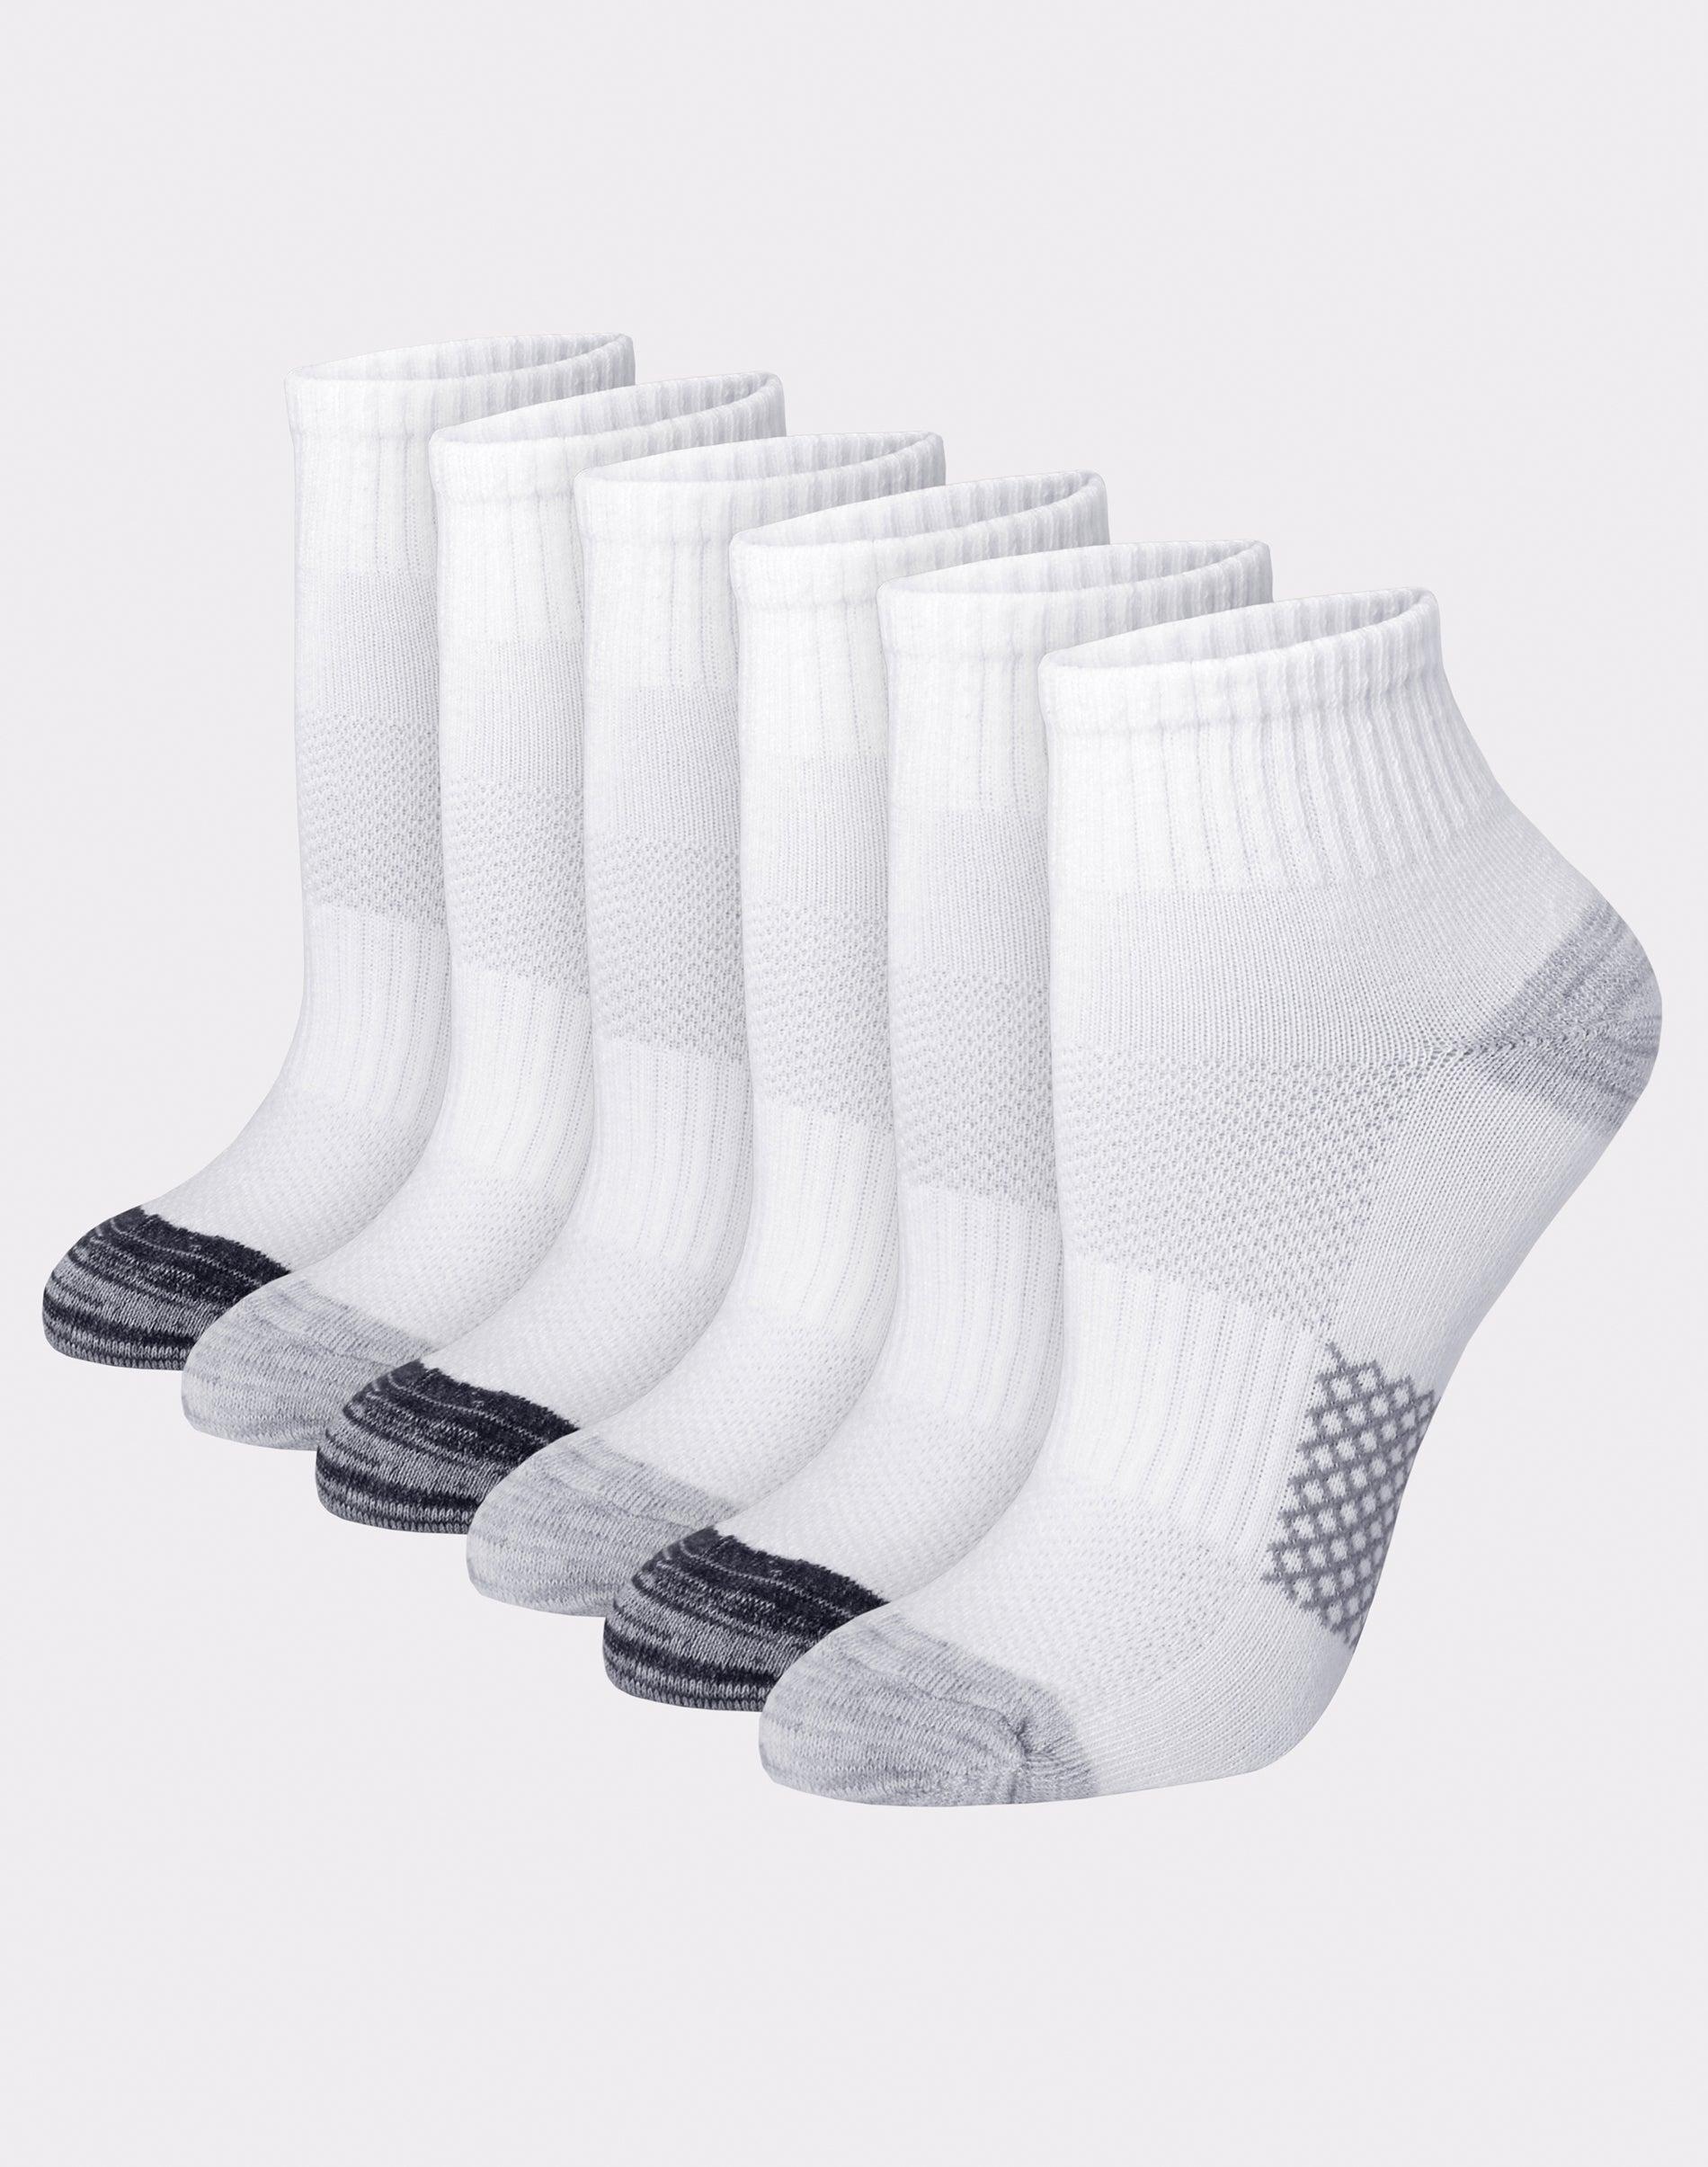 Hanes Crew Socks 6-Pack Women/'s Ultimate ComfortSoft Comfort Toe Black or White